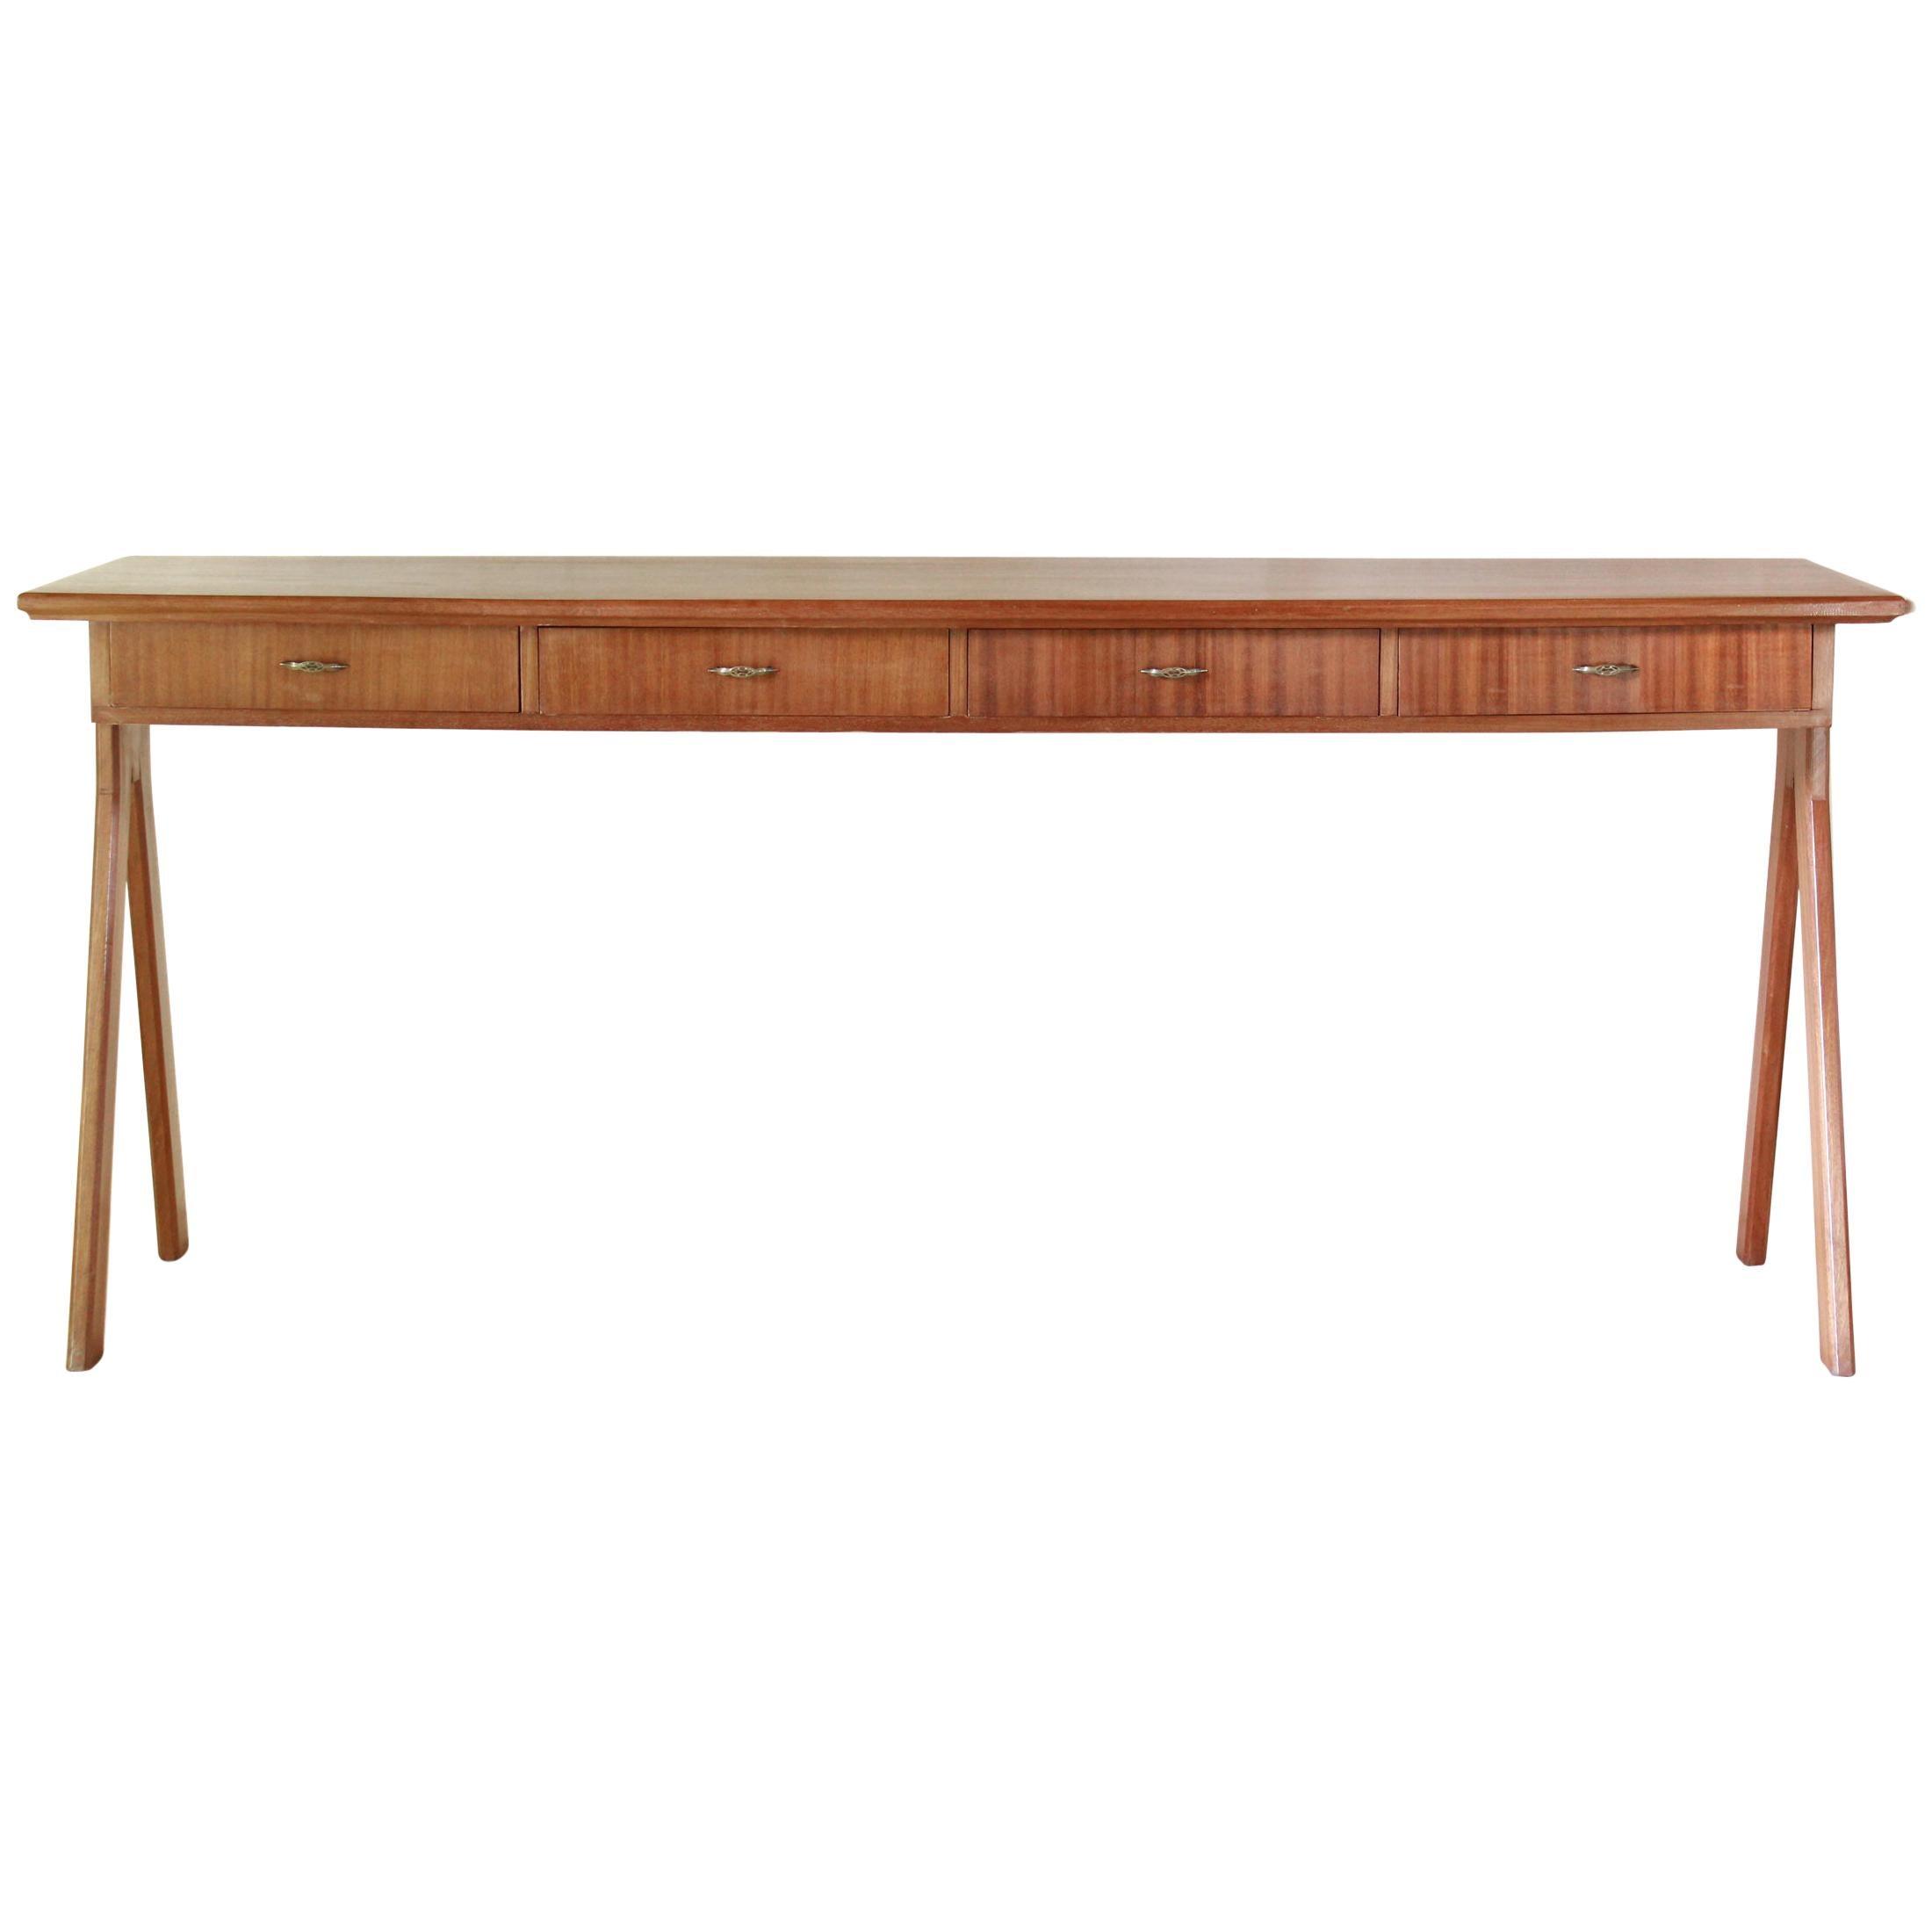 1950 Mahogany Vintage Console Table